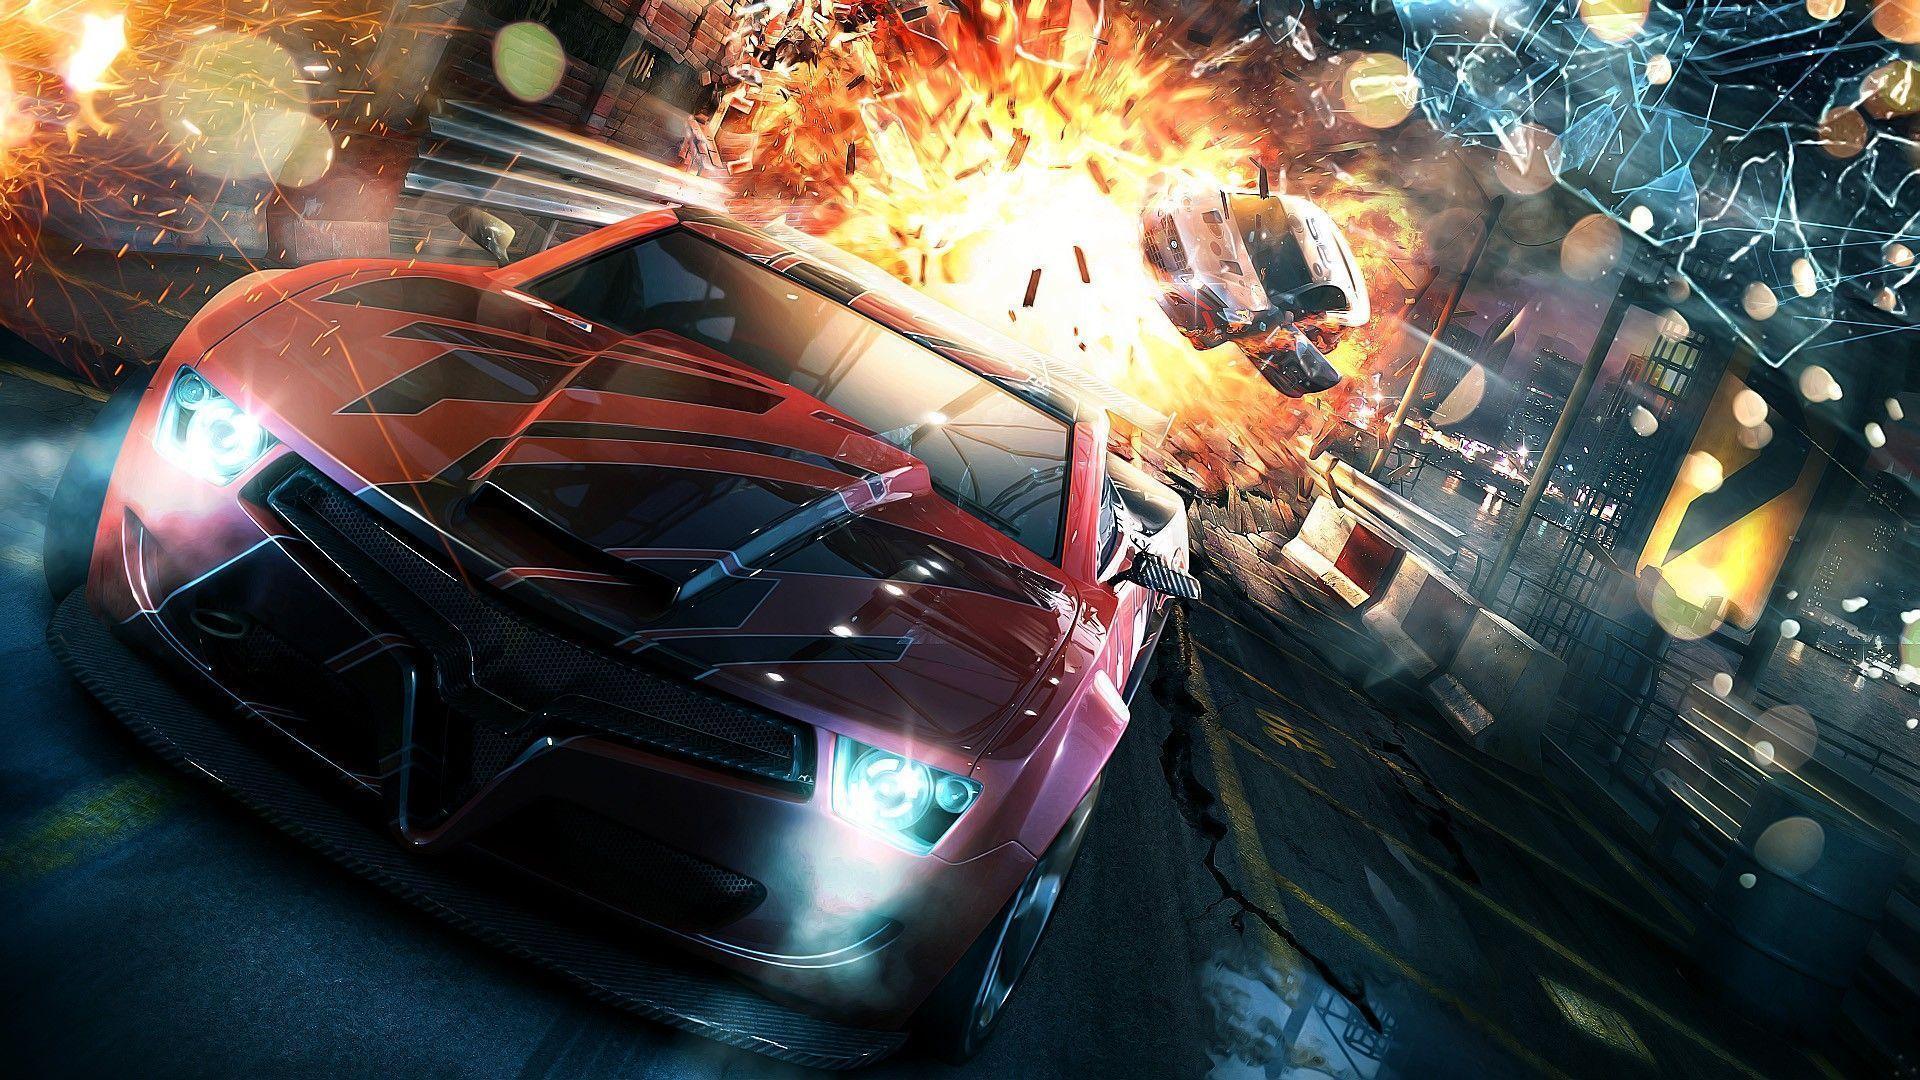 Car Explosion Games Online